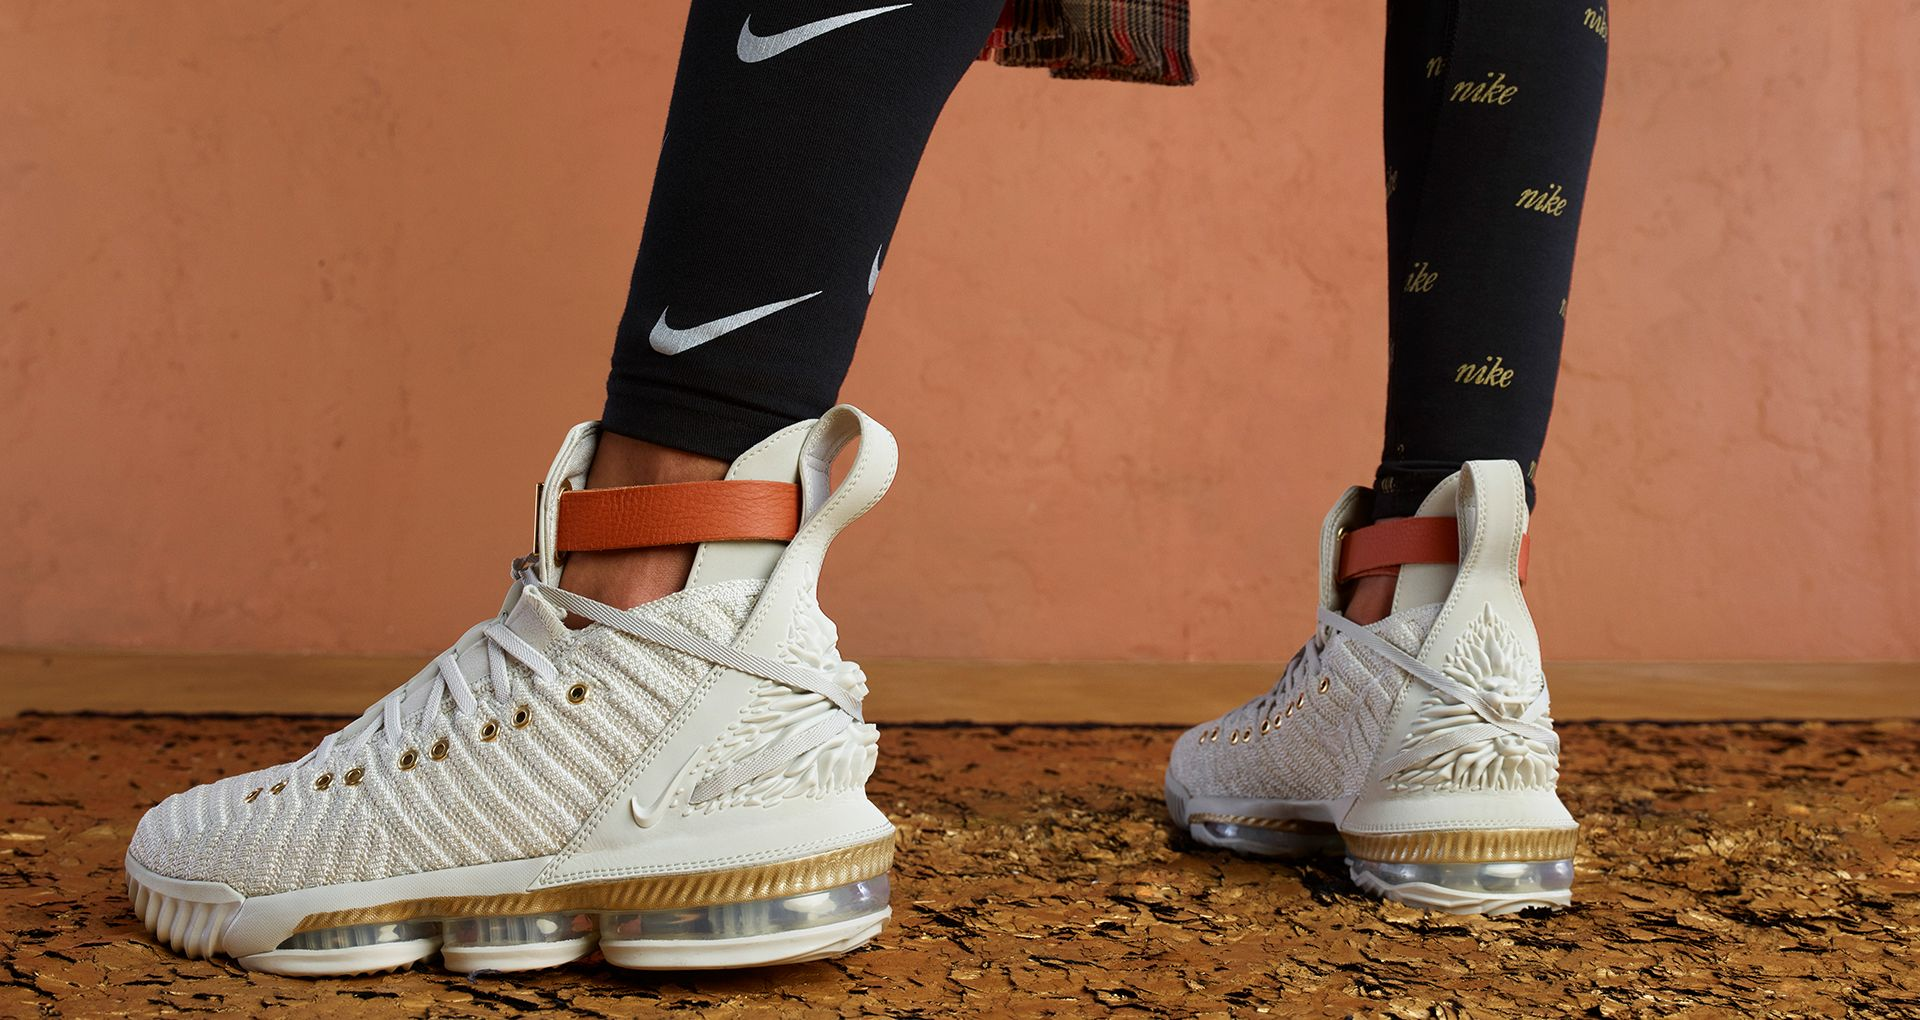 HFR x Nike Wmns LeBron 16 Lmtd